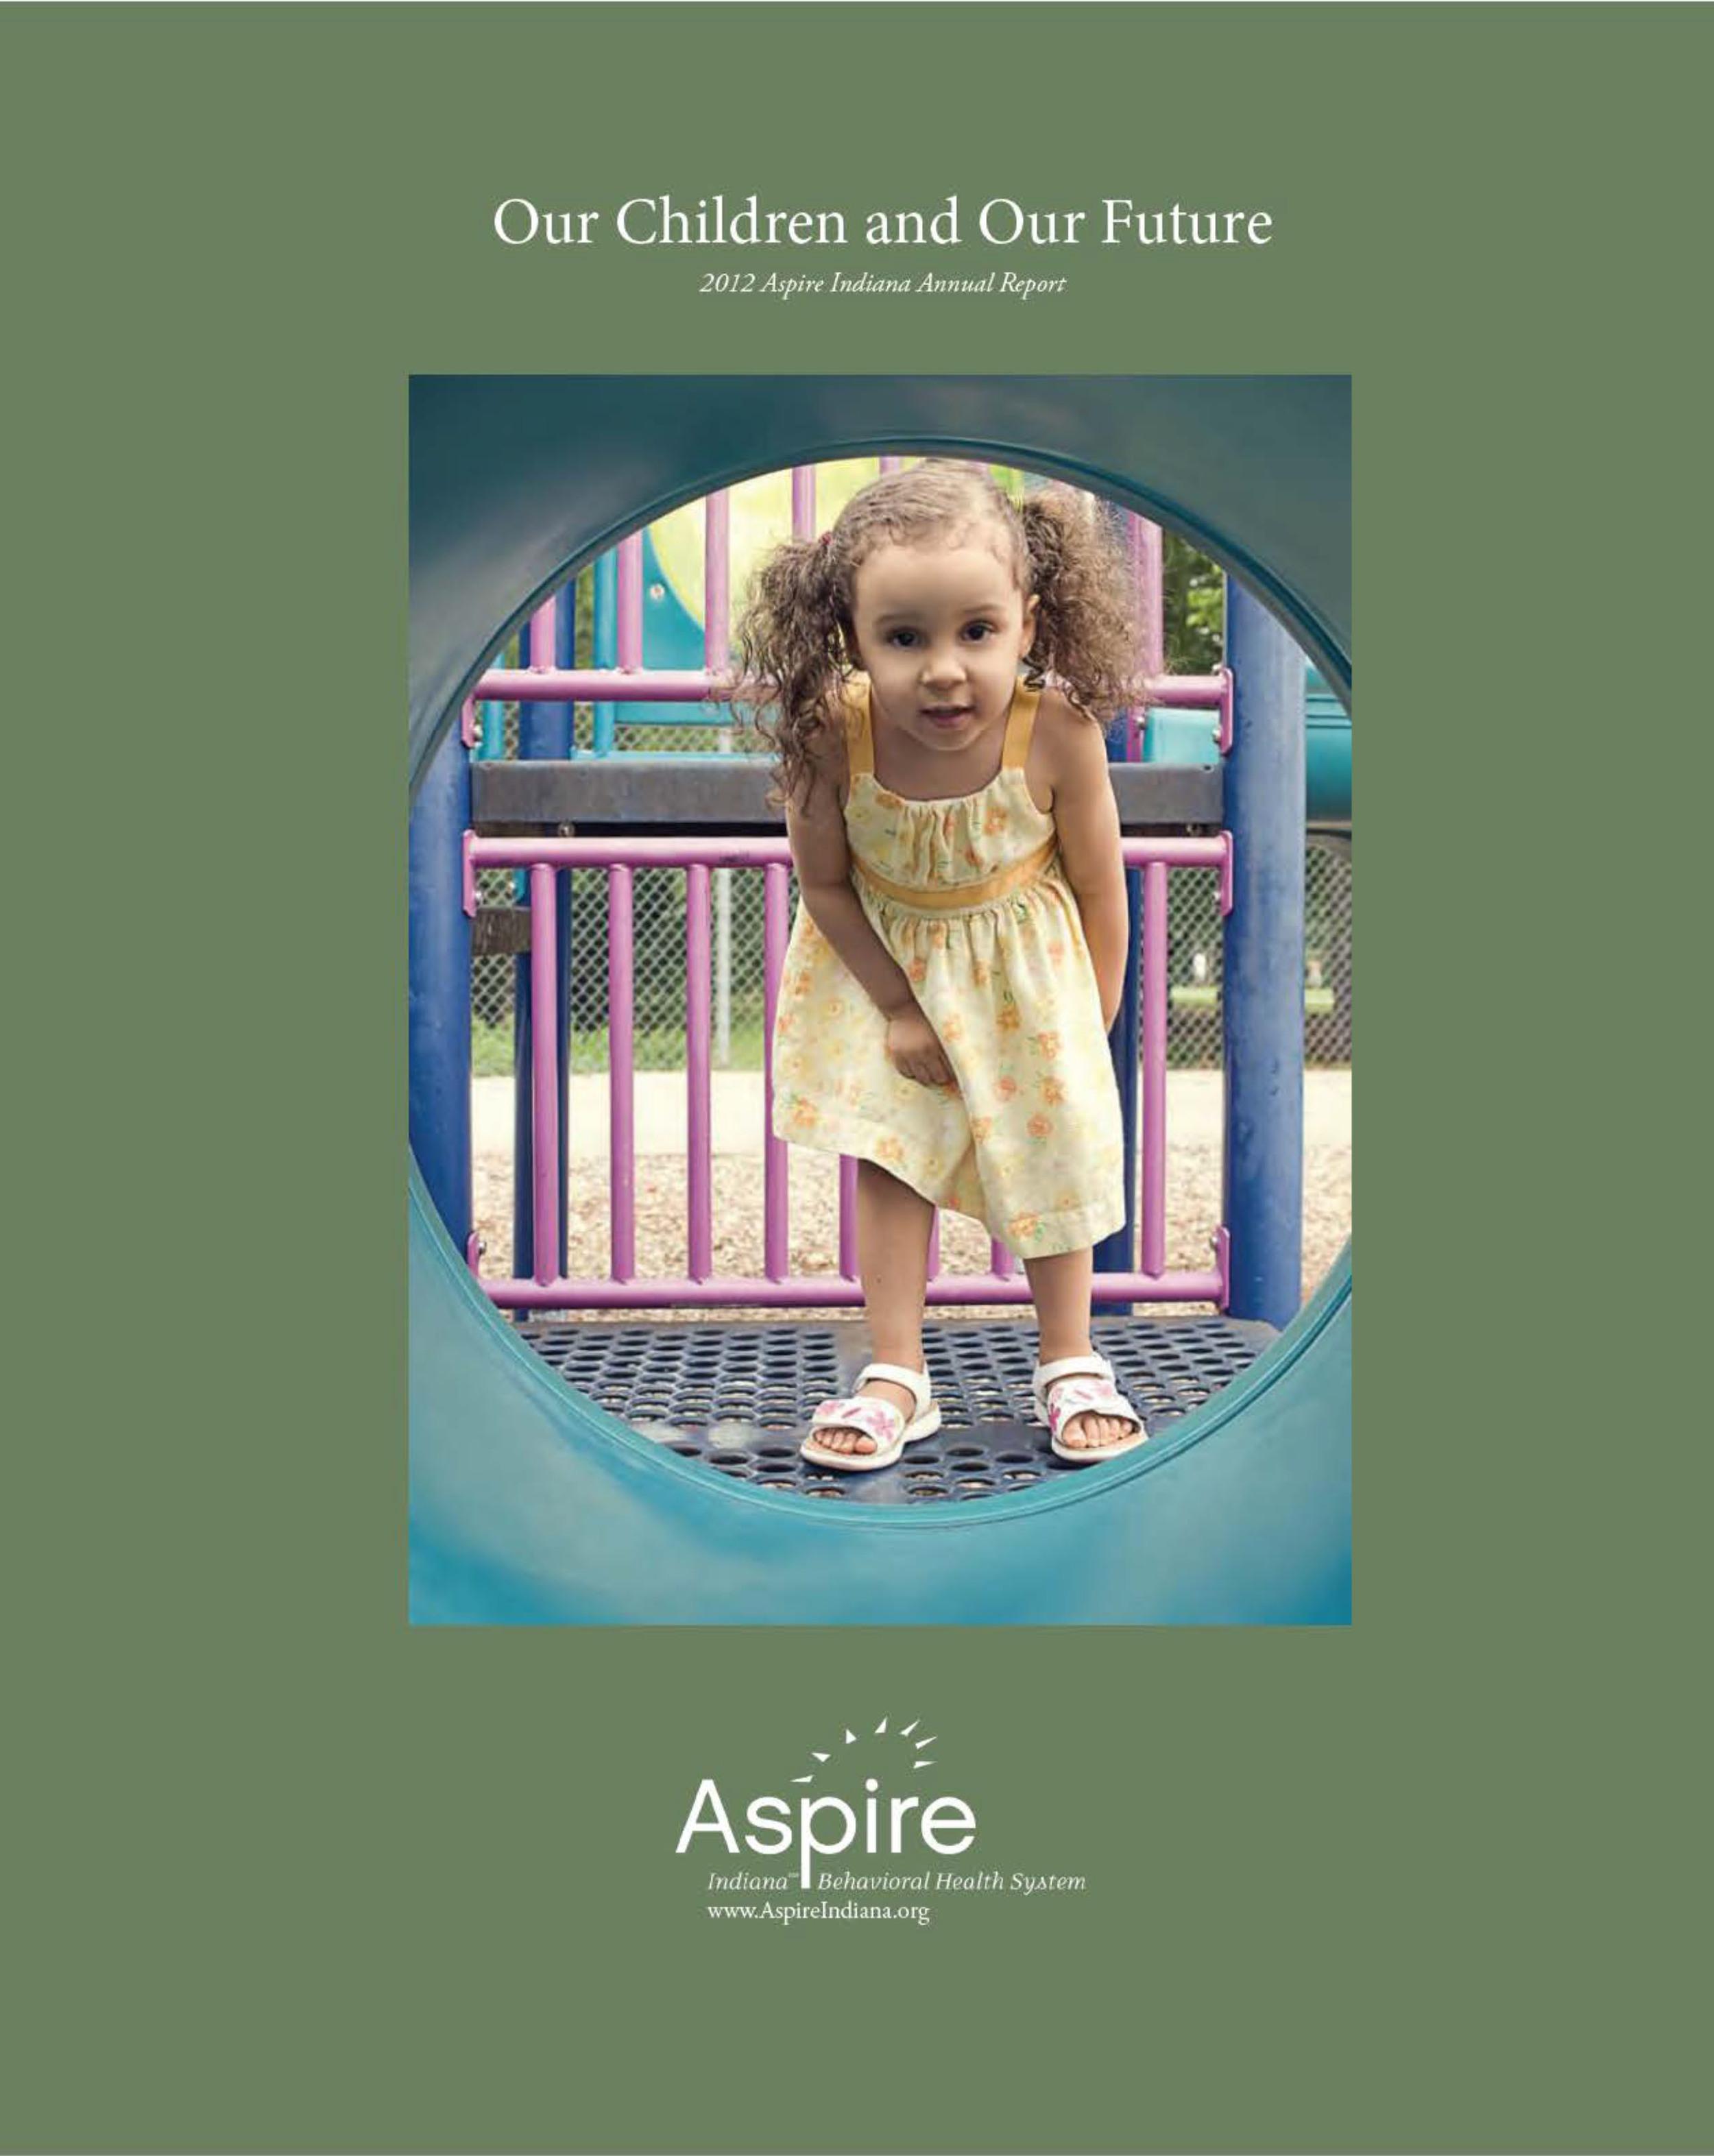 Aspire Indiana Annual Report 2012